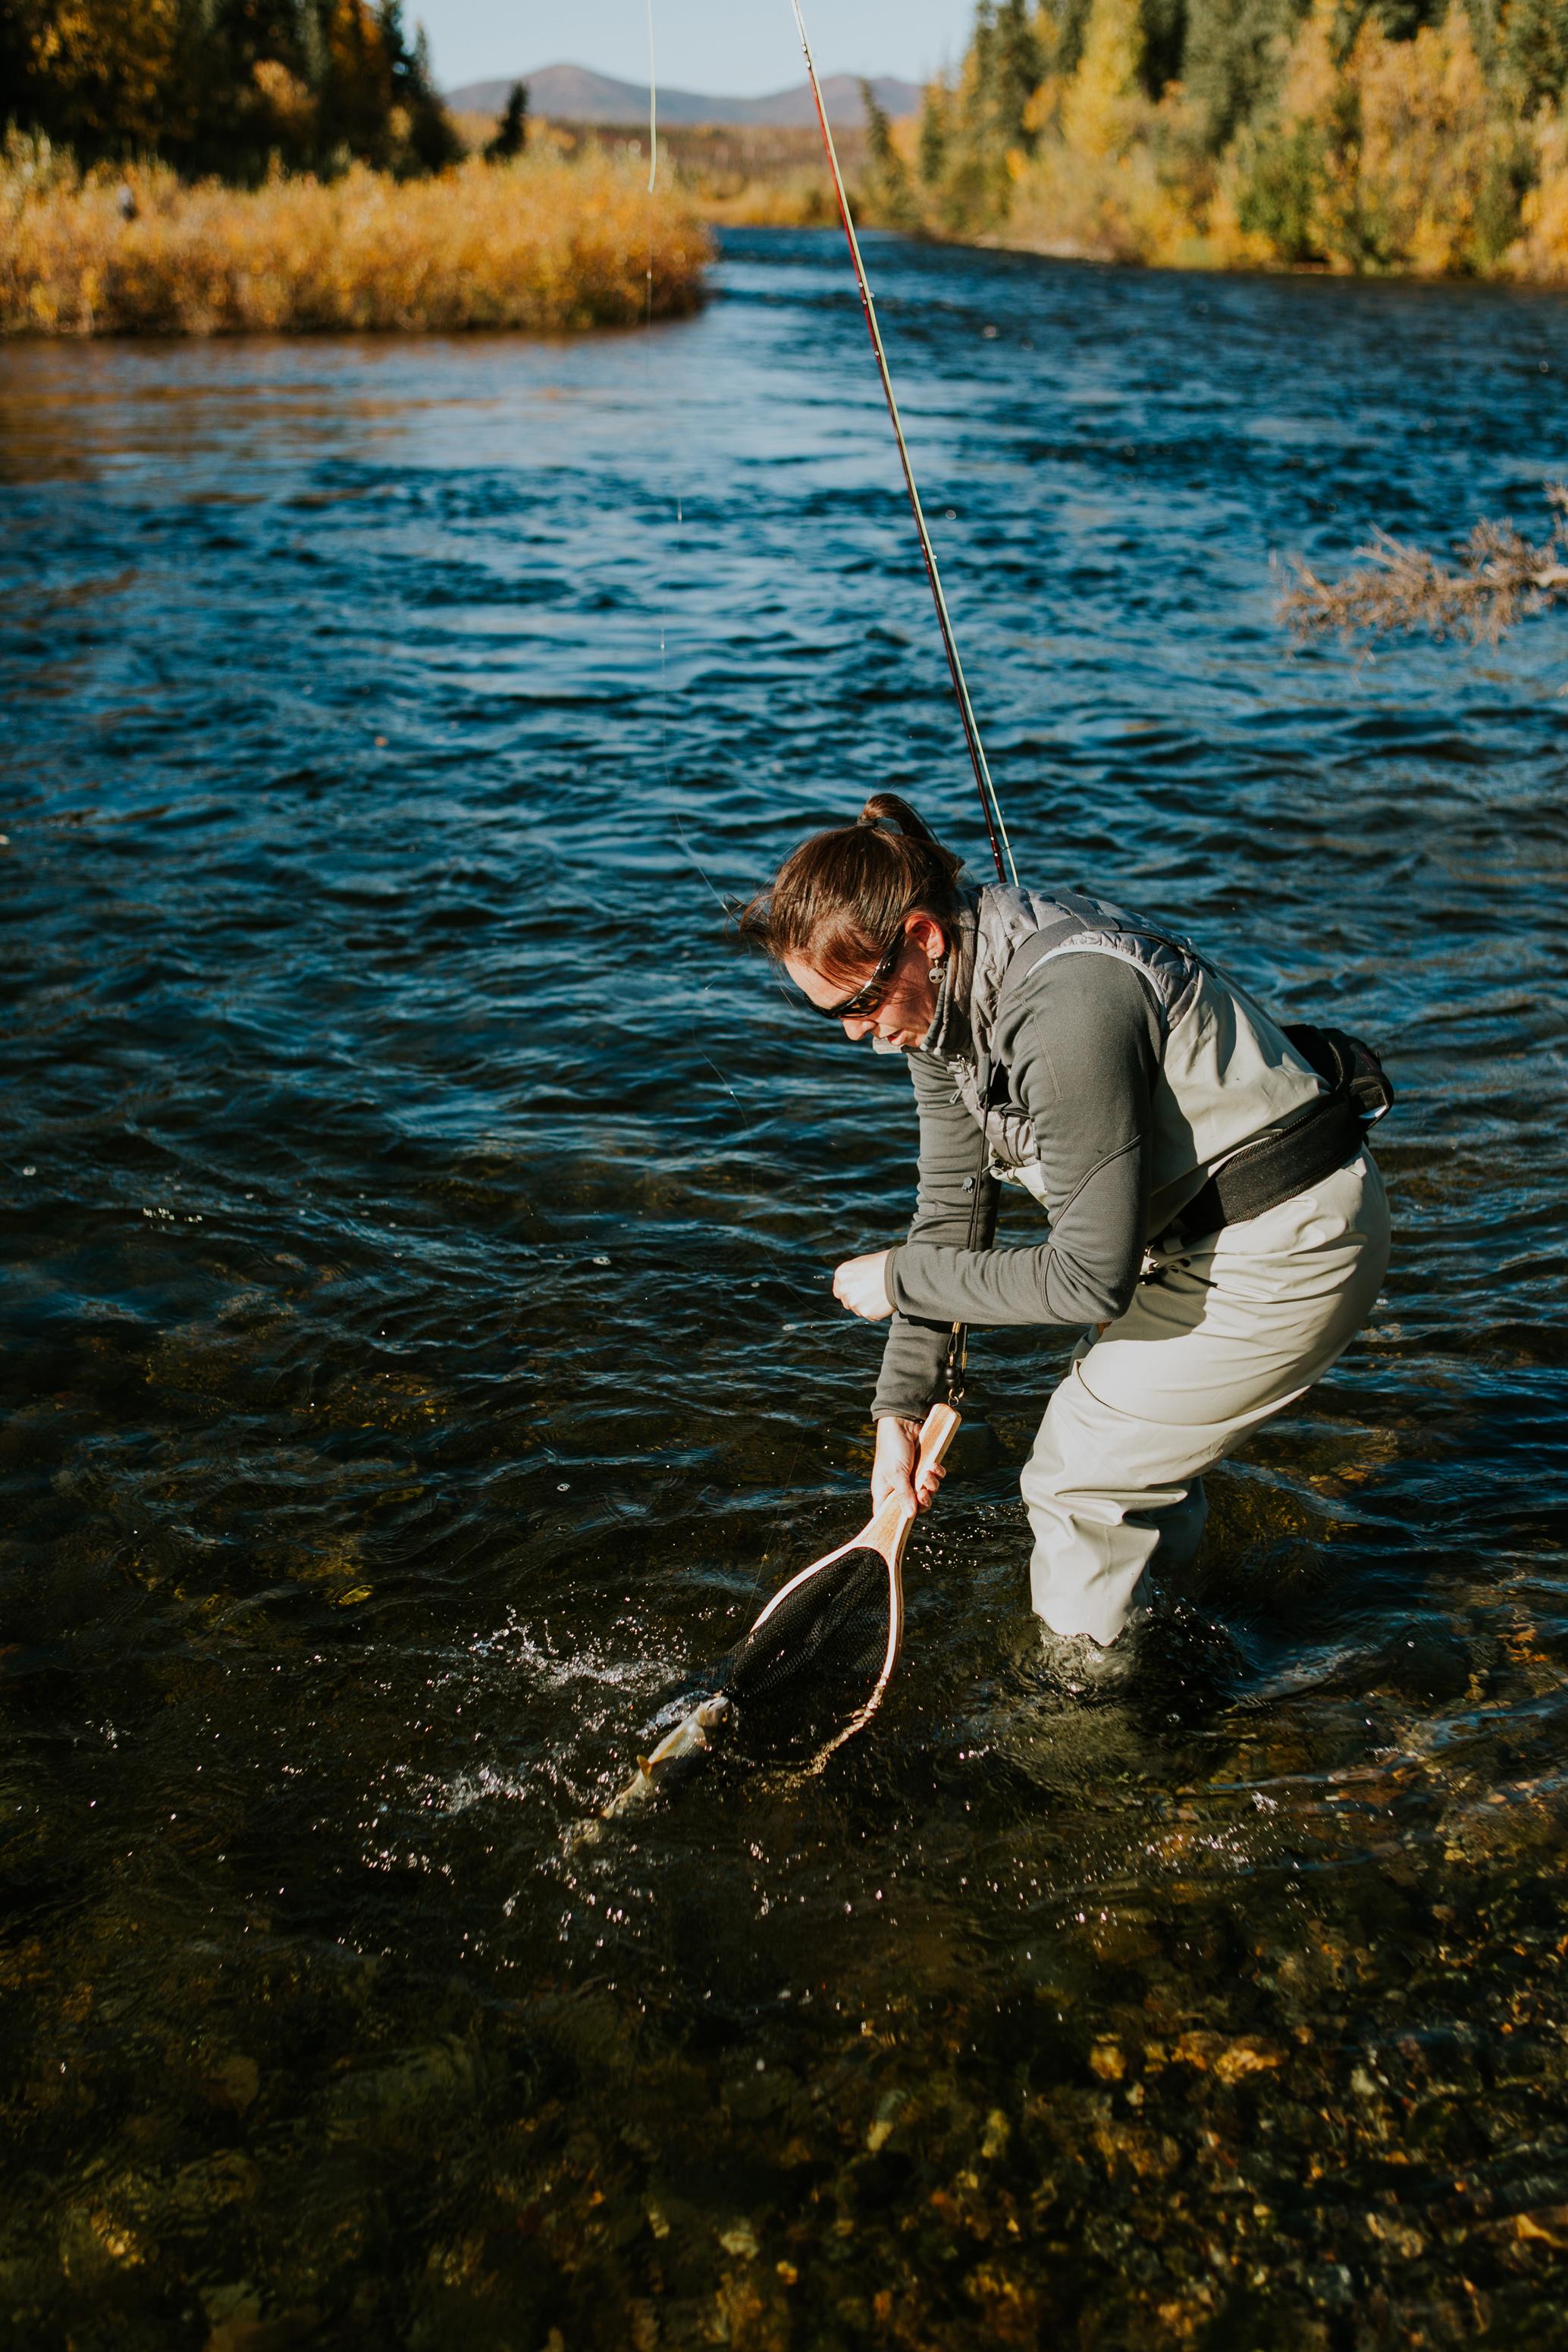 CindyGiovagnoli_Alaska_KoyukukRiver_SukakpakMountain_JimRiver_ArcticCircle_fly_fishing_September-065.jpg